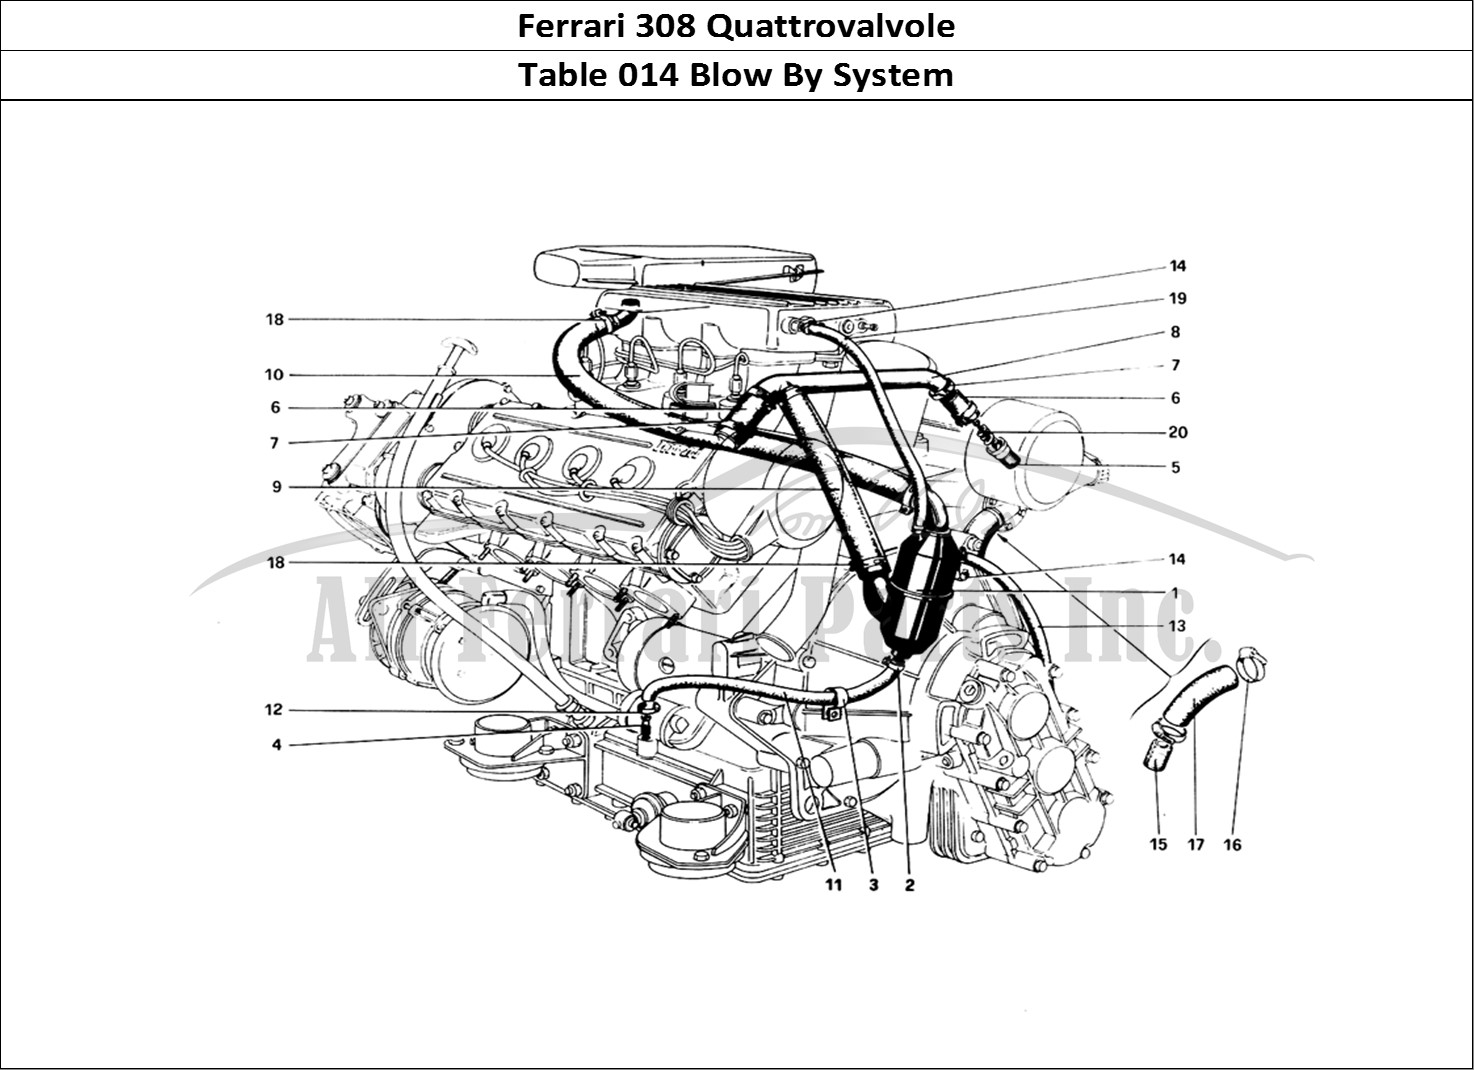 buy original ferrari 308 quattrovalvole 014 blow by system ferrari parts  spares  accessories online